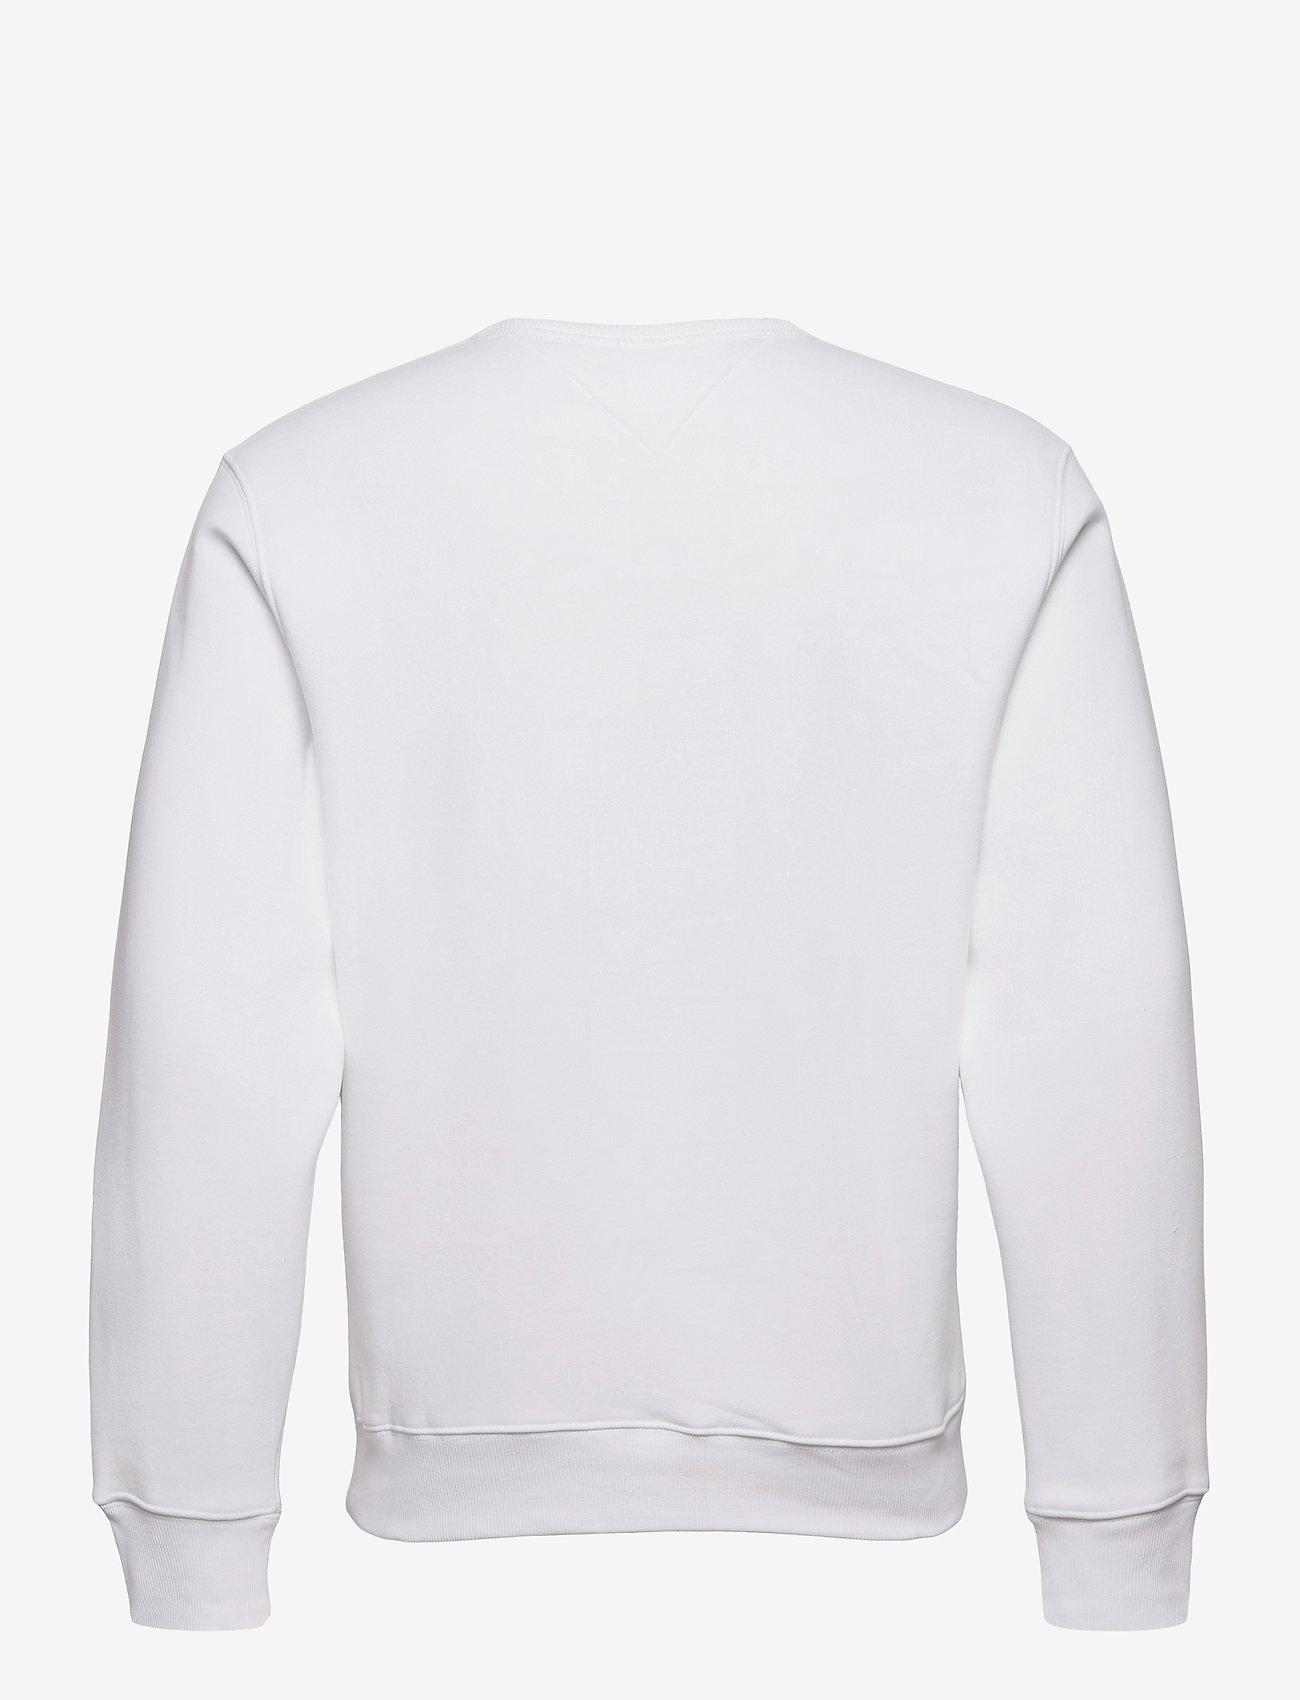 Tommy Jeans - TJM OMBRE CORP LOGO CREW - kläder - white - 1